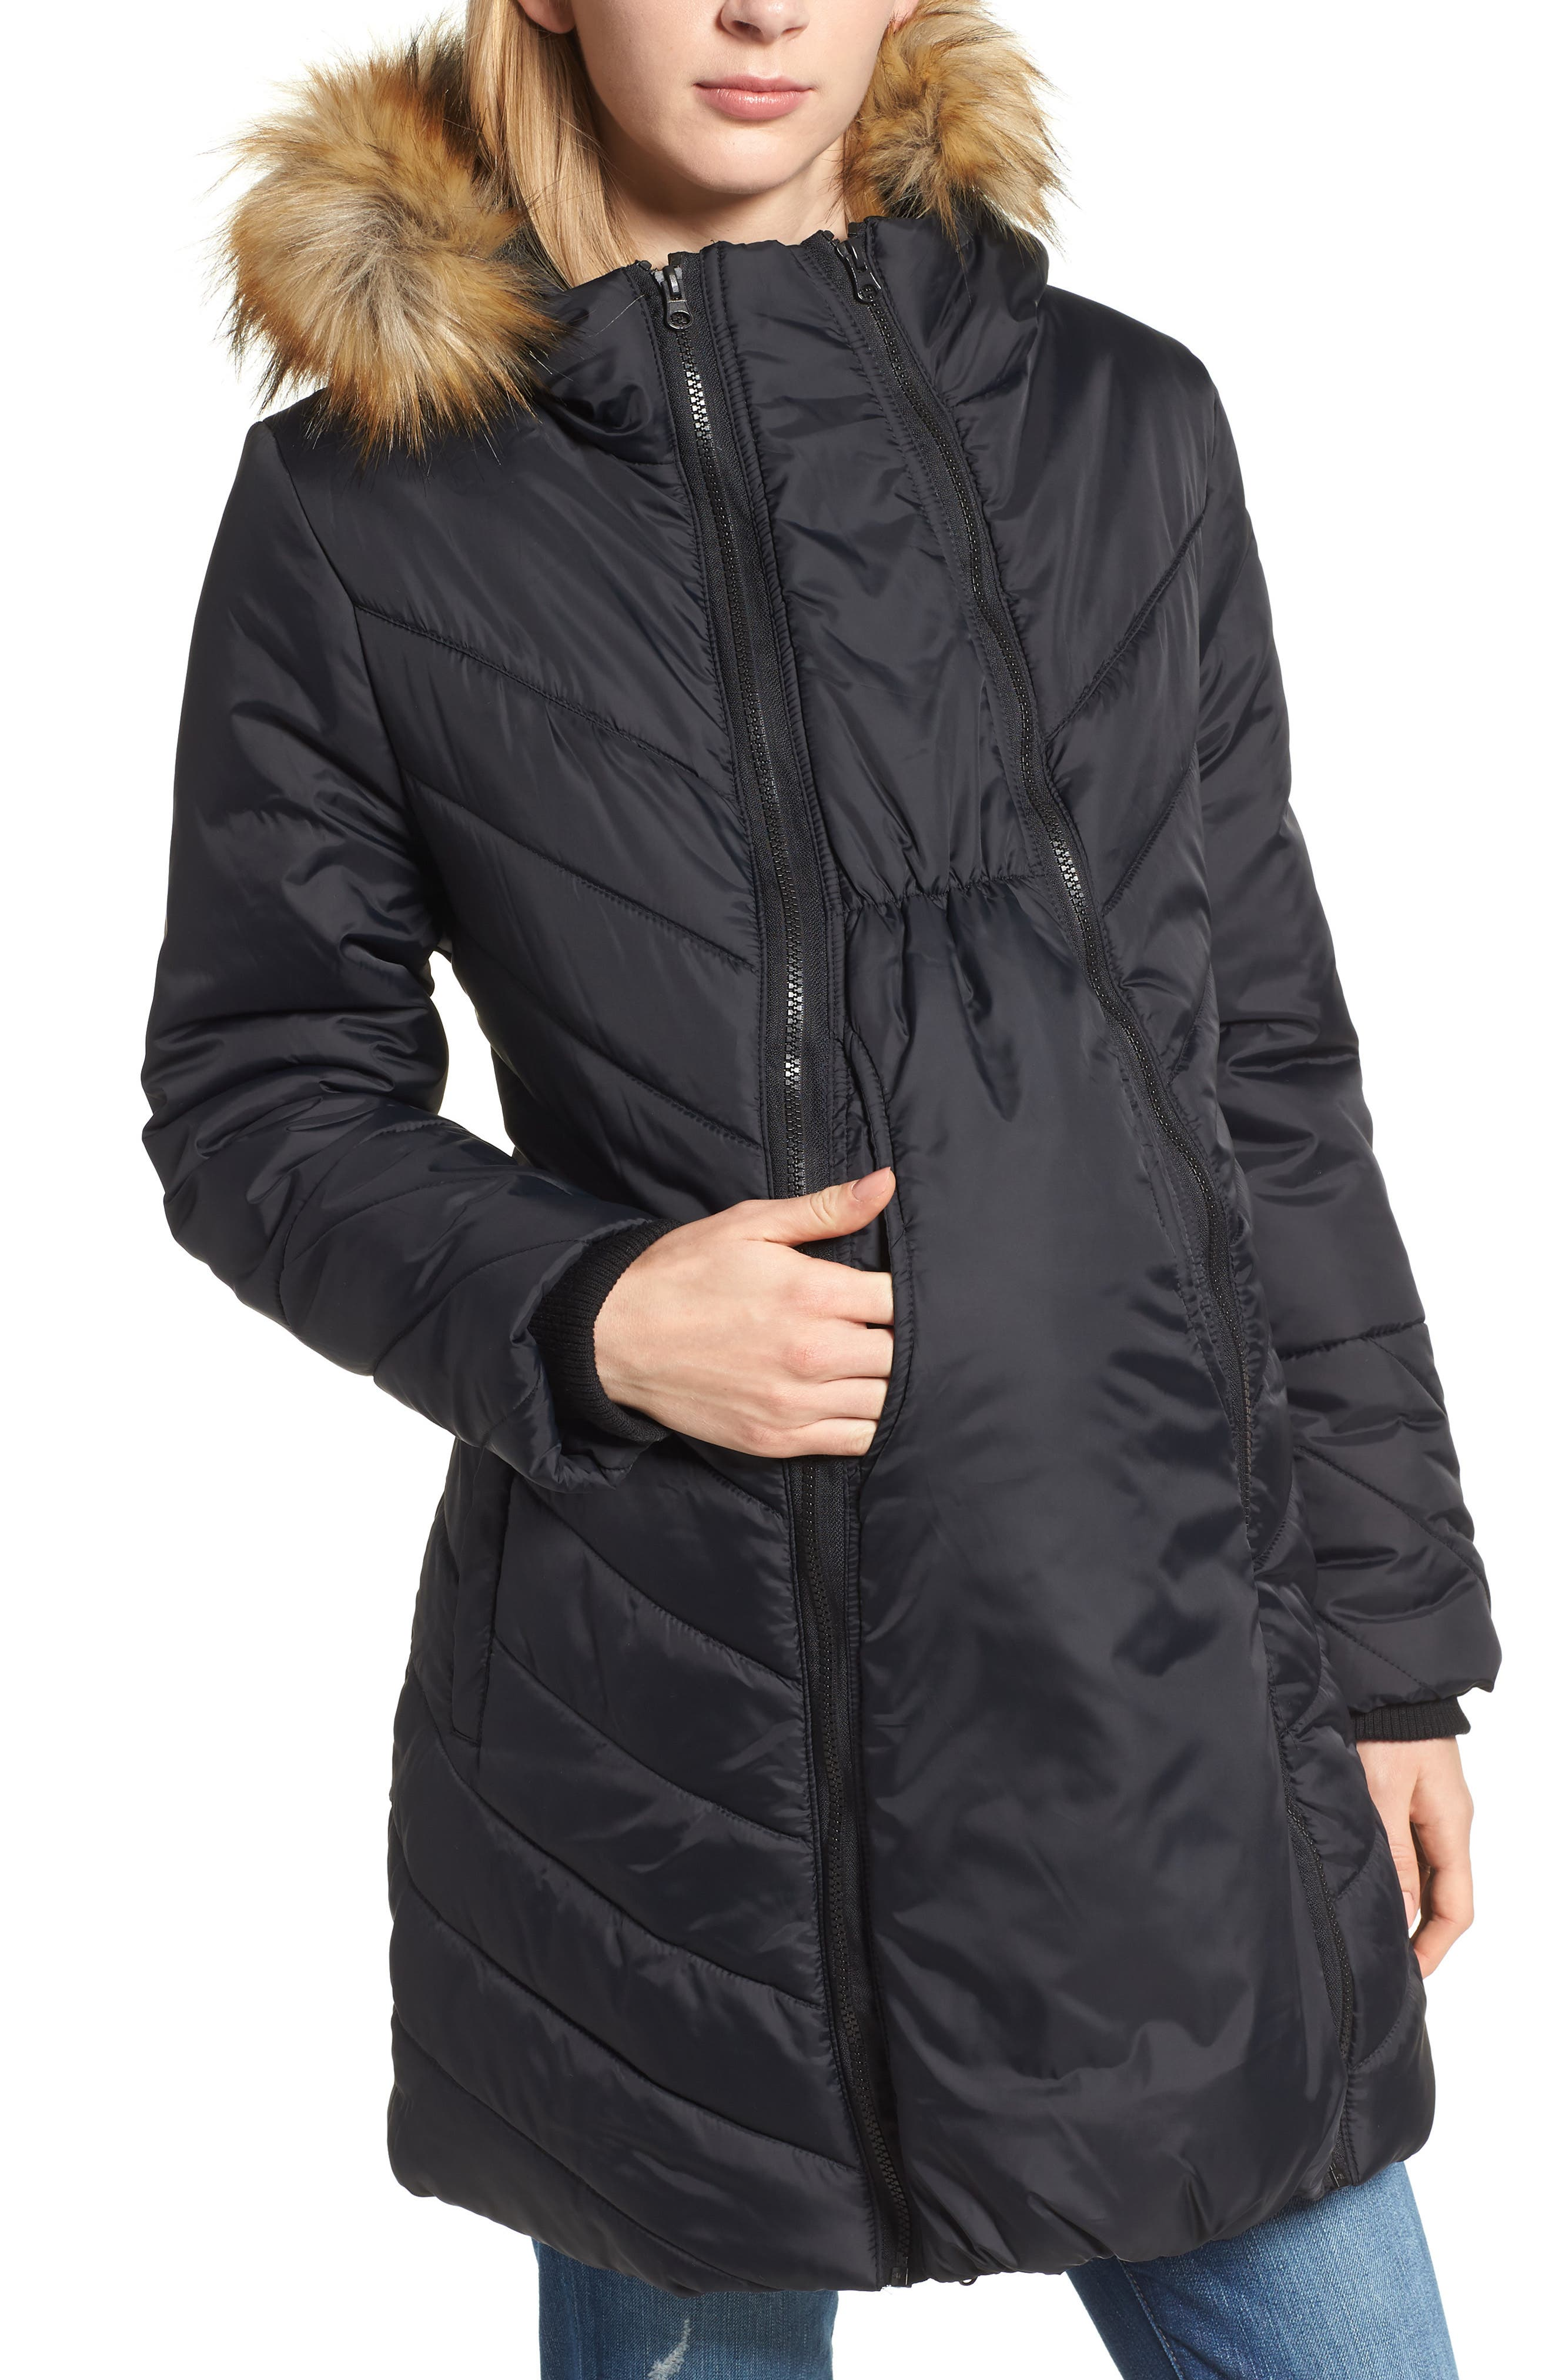 Main Image - Modern Eternity Faux Fur Convertible Puffer Maternity Jacket